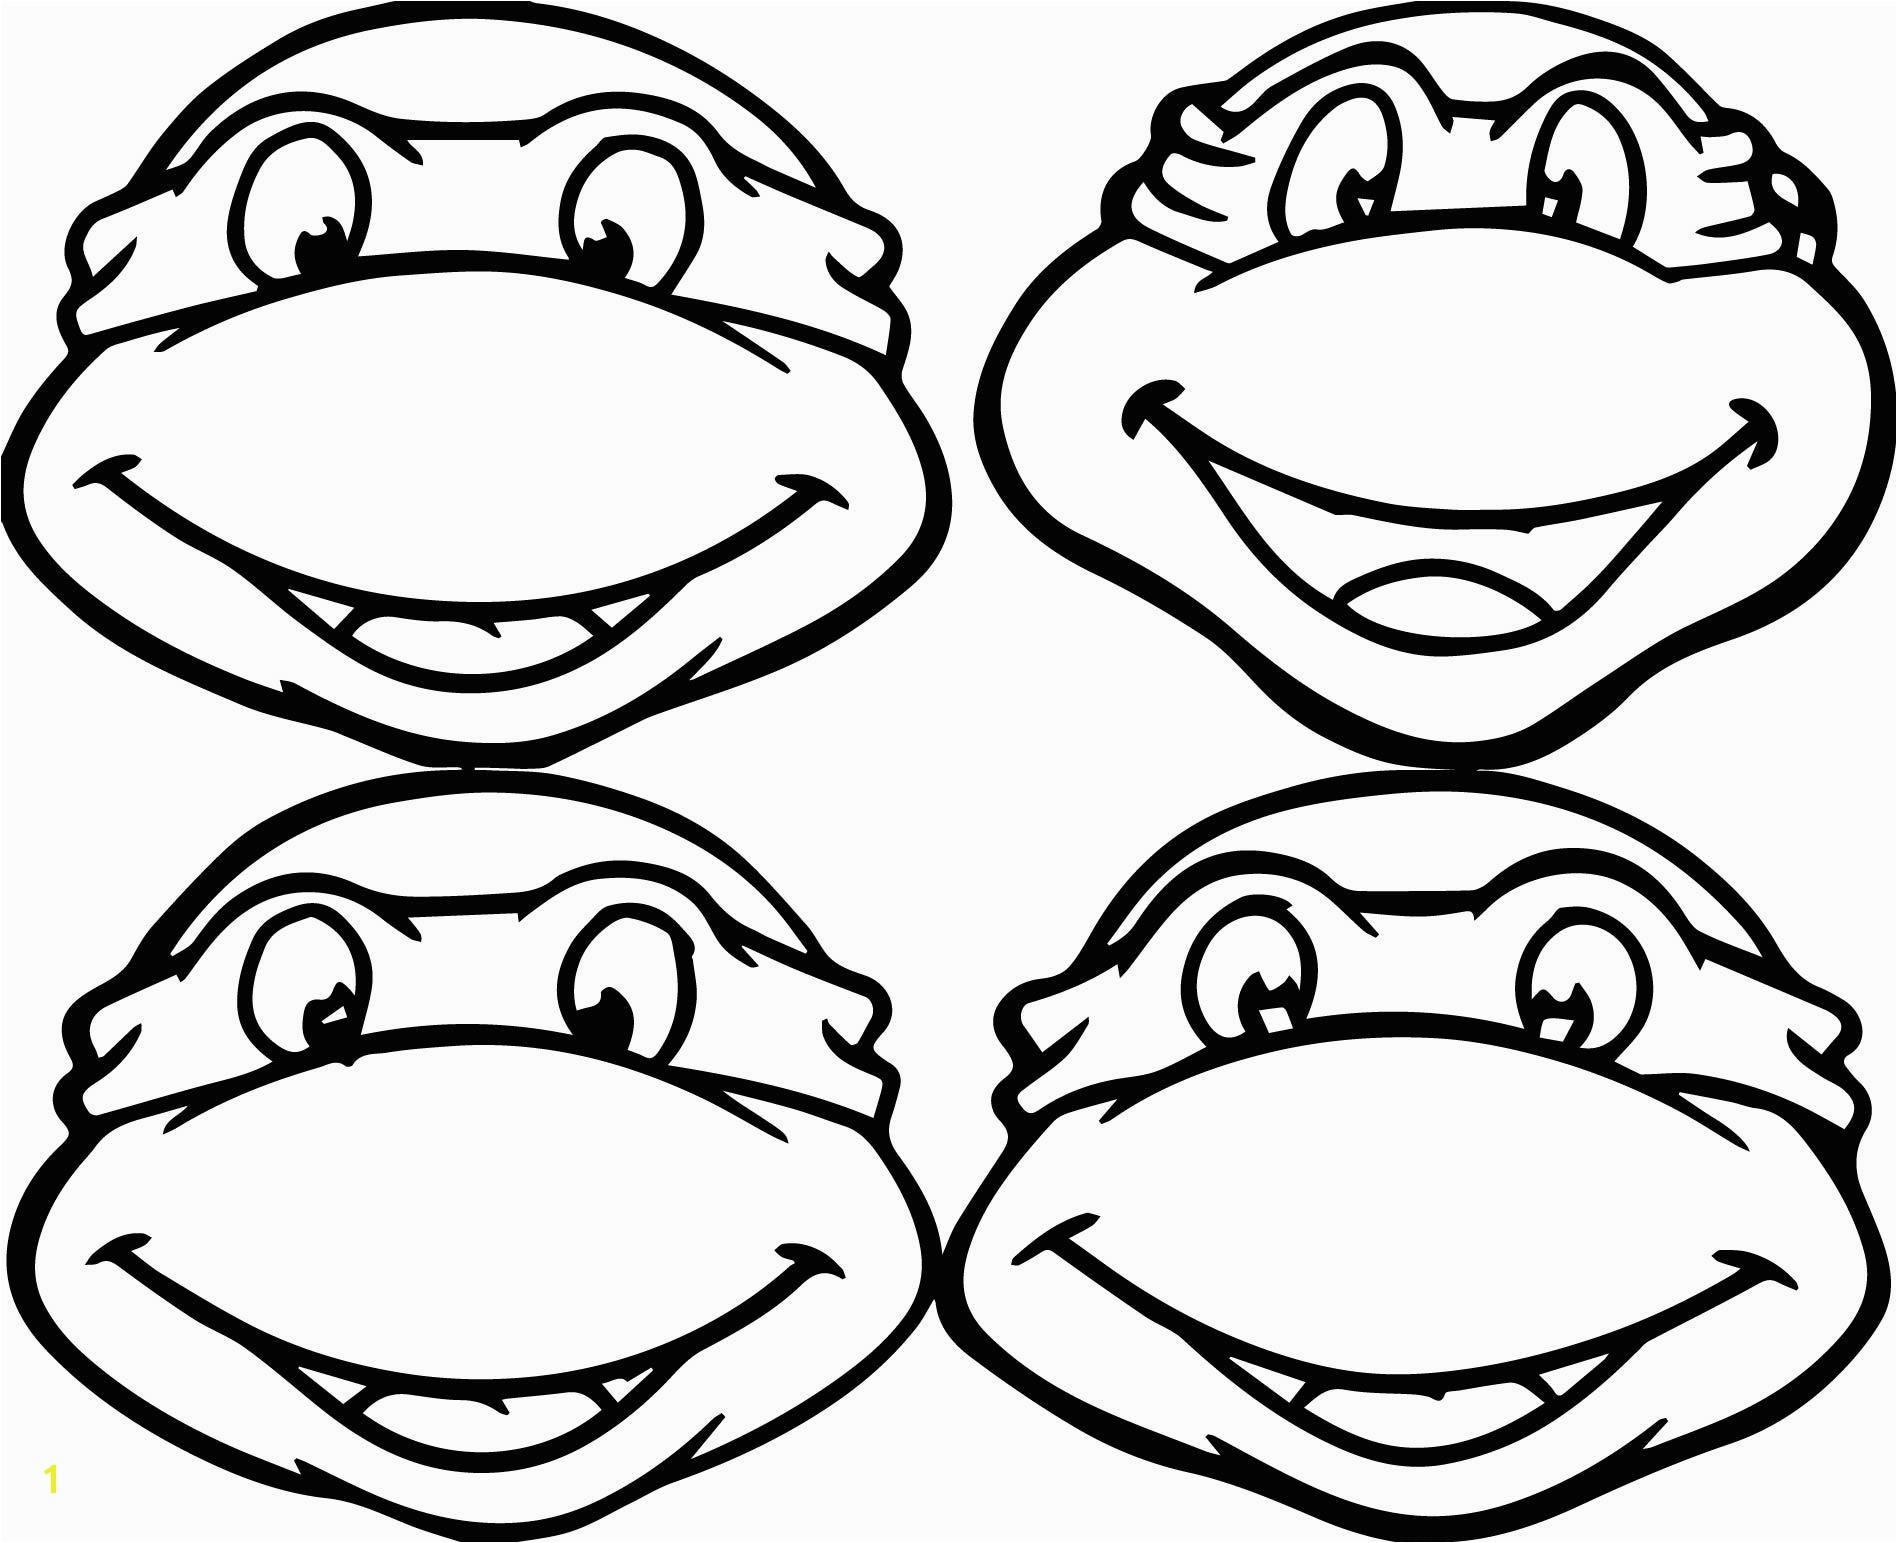 Confidential Teenage Mutant Ninja Turtles Coloring Pages To Print Innovative Turtle Color Simple Splendid